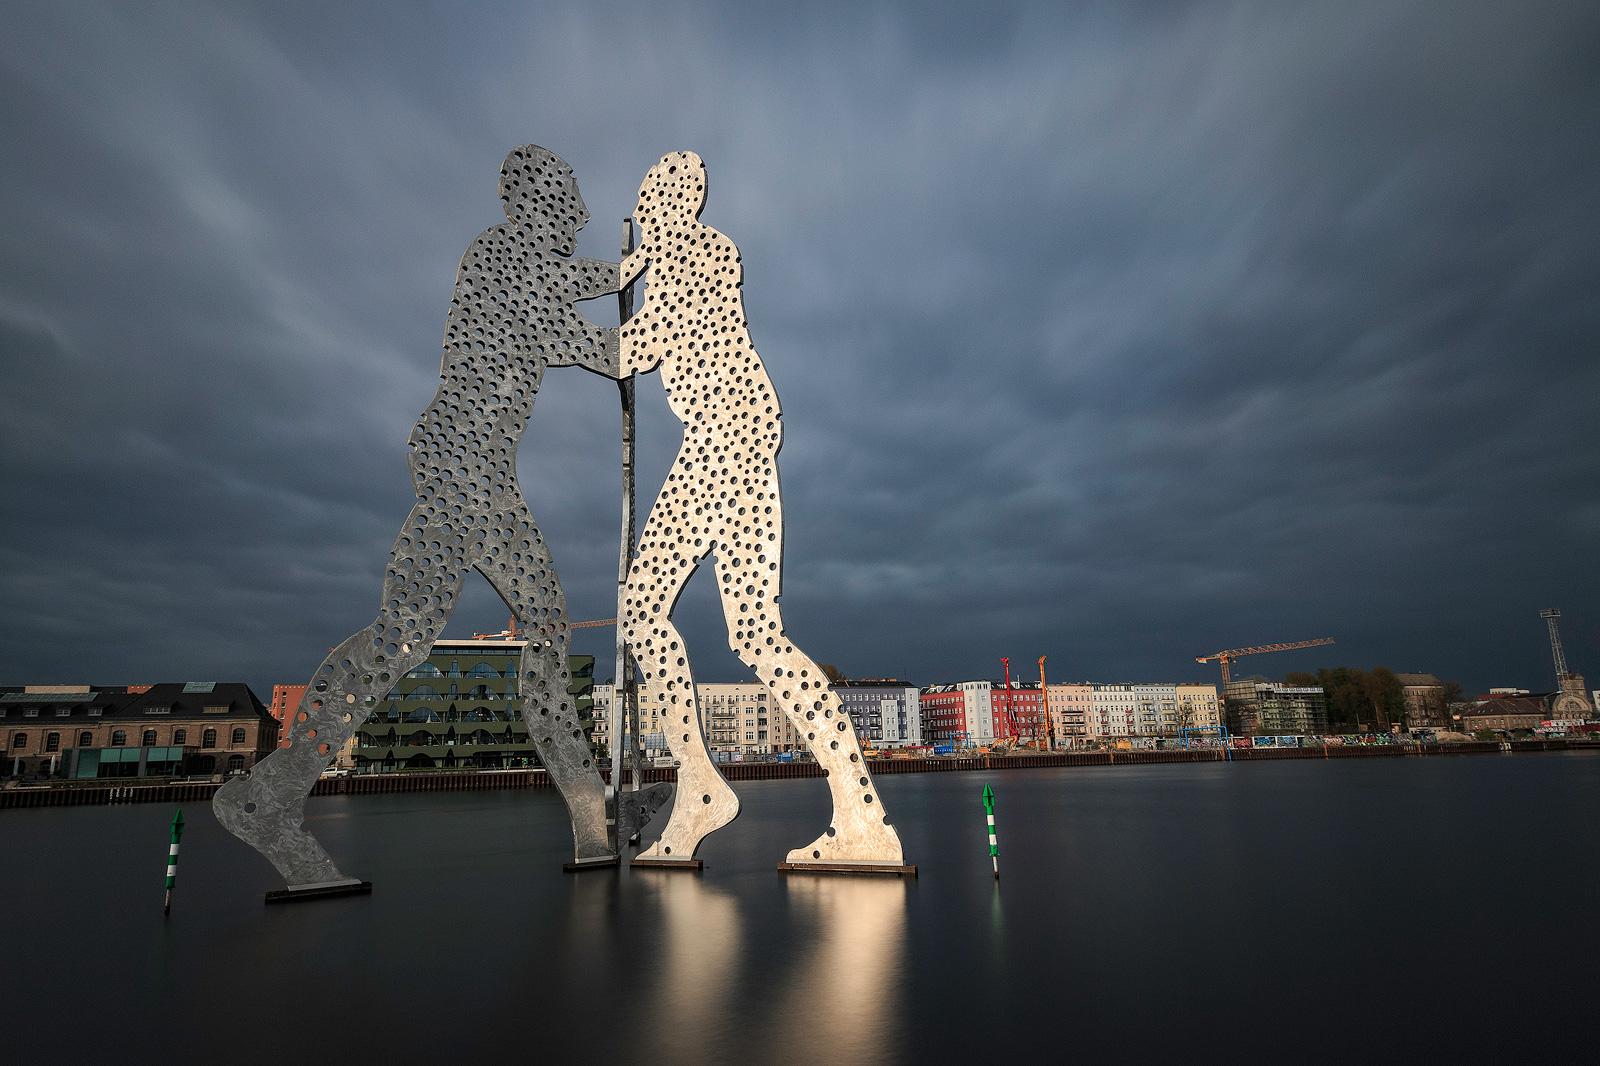 Skulptur Molecule Man in der Spree in Berlin